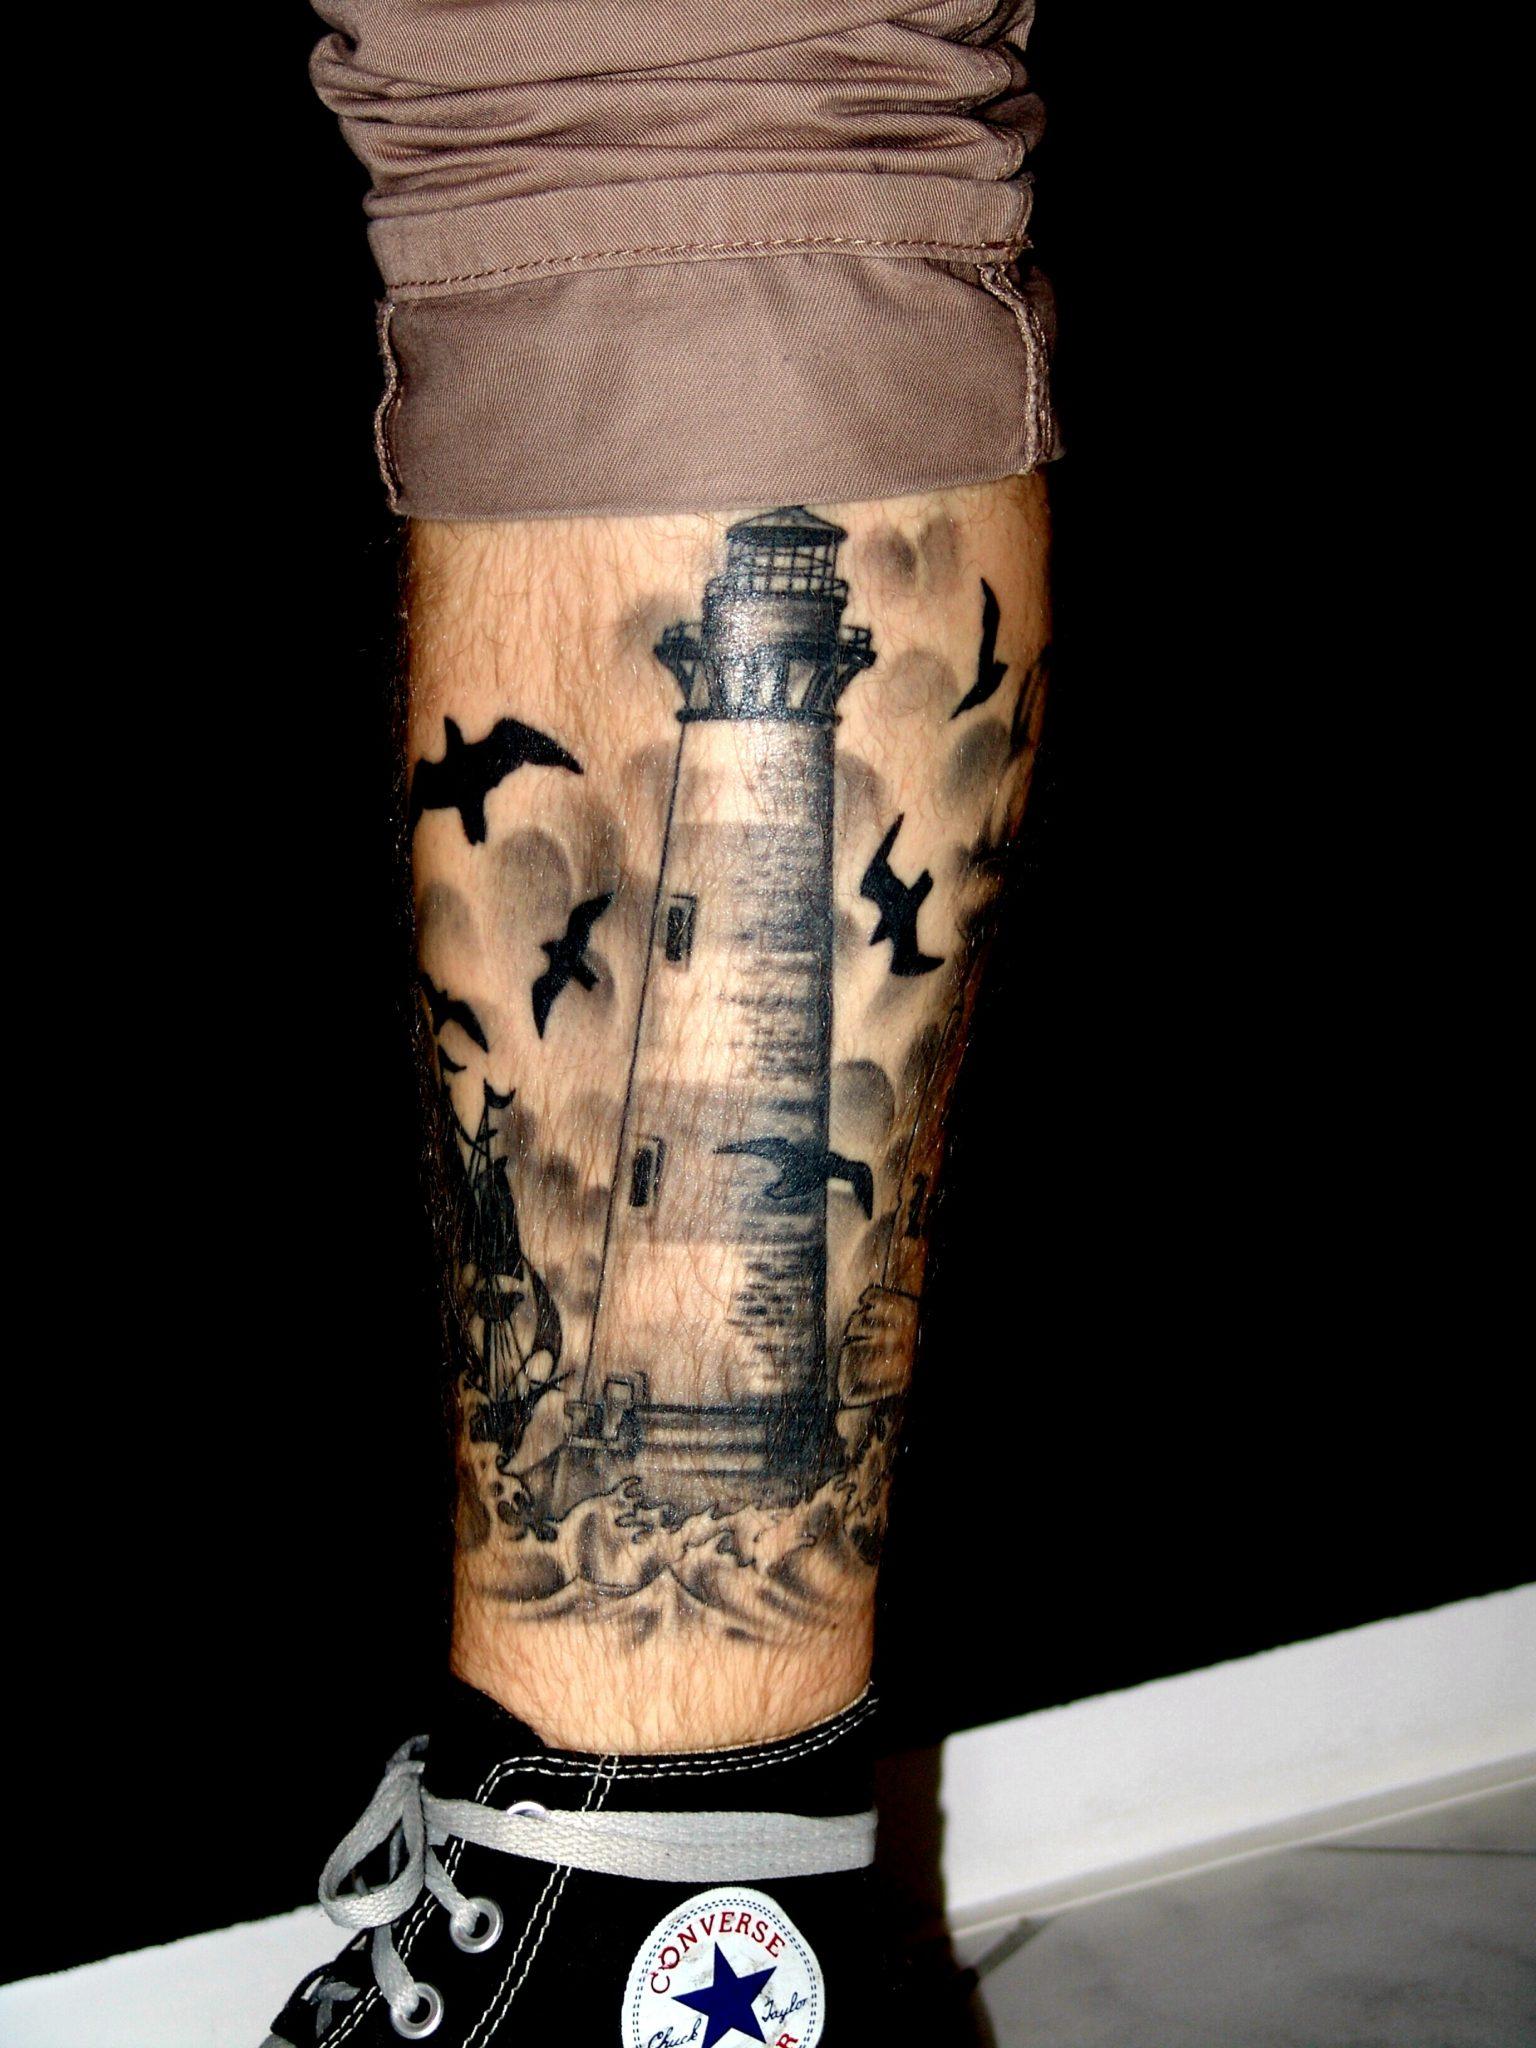 Fluch & Segen Tattoo & Piercing Studio Großefehn